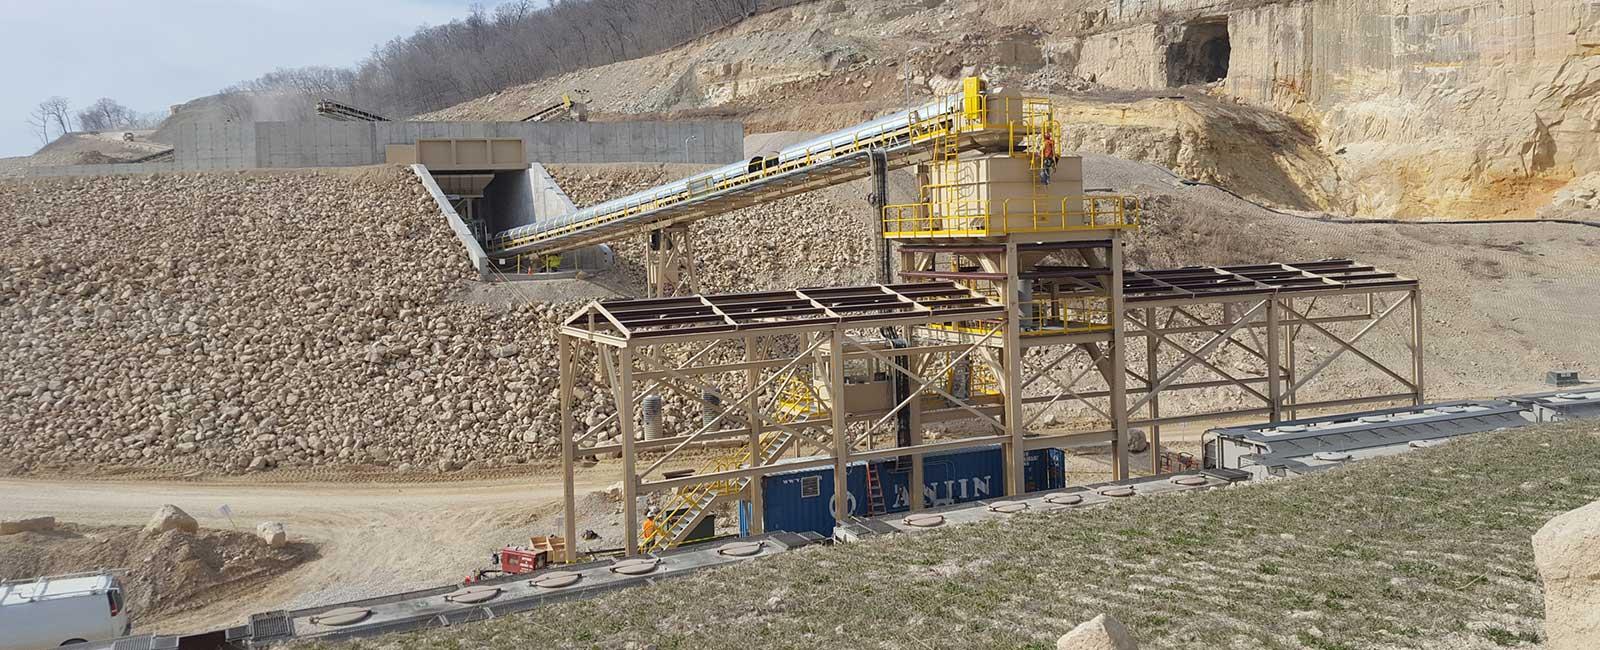 Pattison Sand Company Aggregate Loading Conveyor